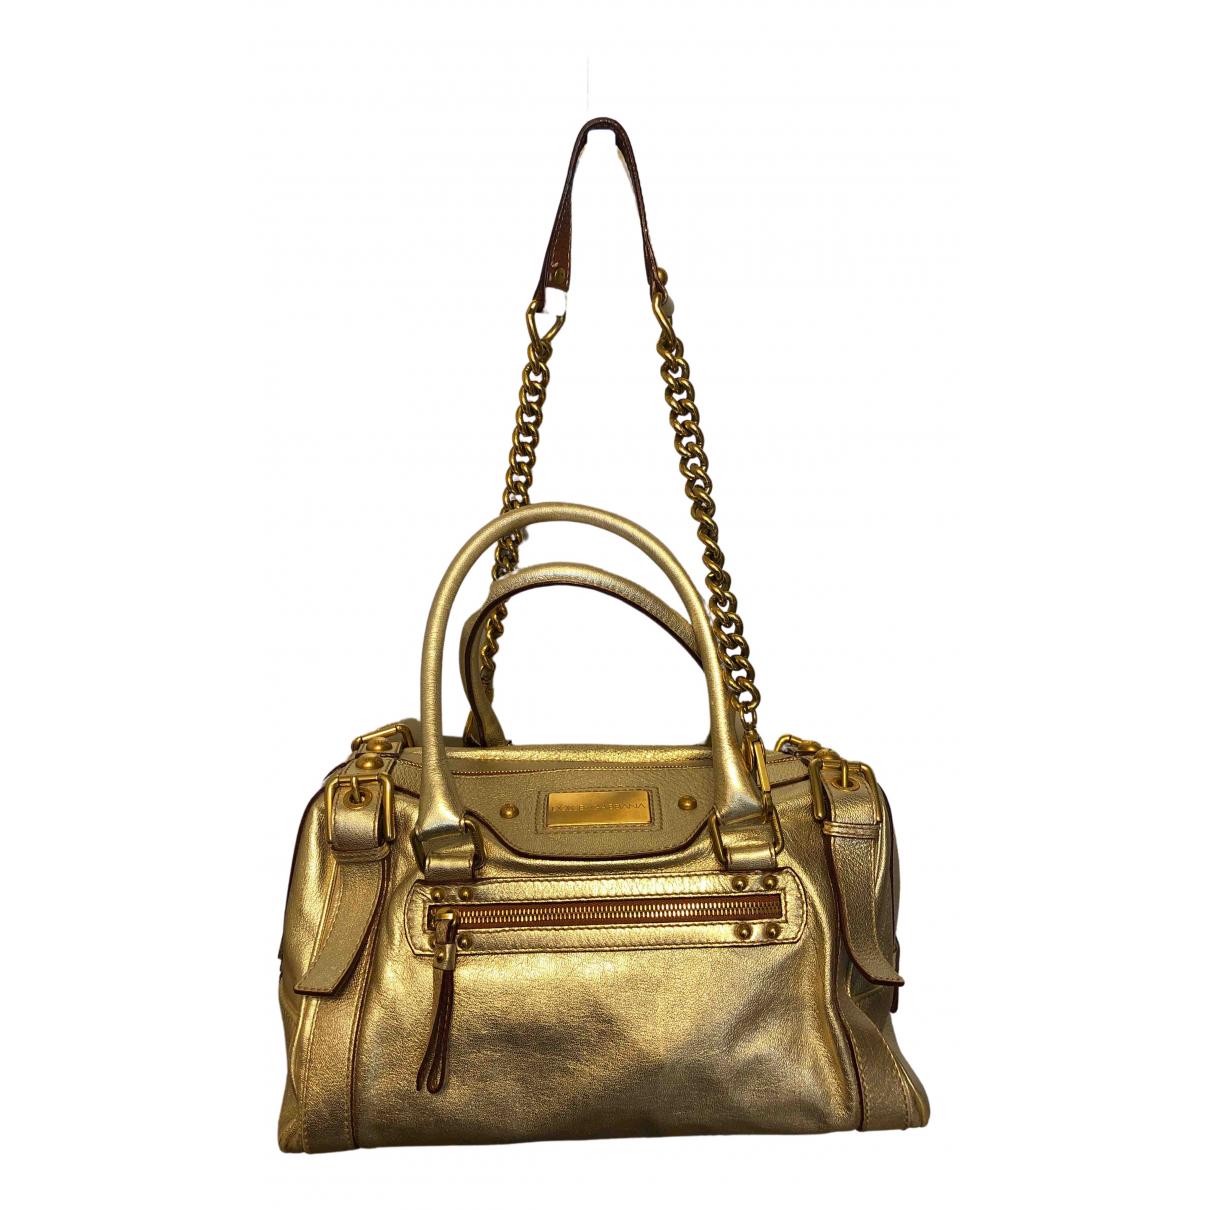 Dolce & Gabbana N Metallic Leather handbag for Women N